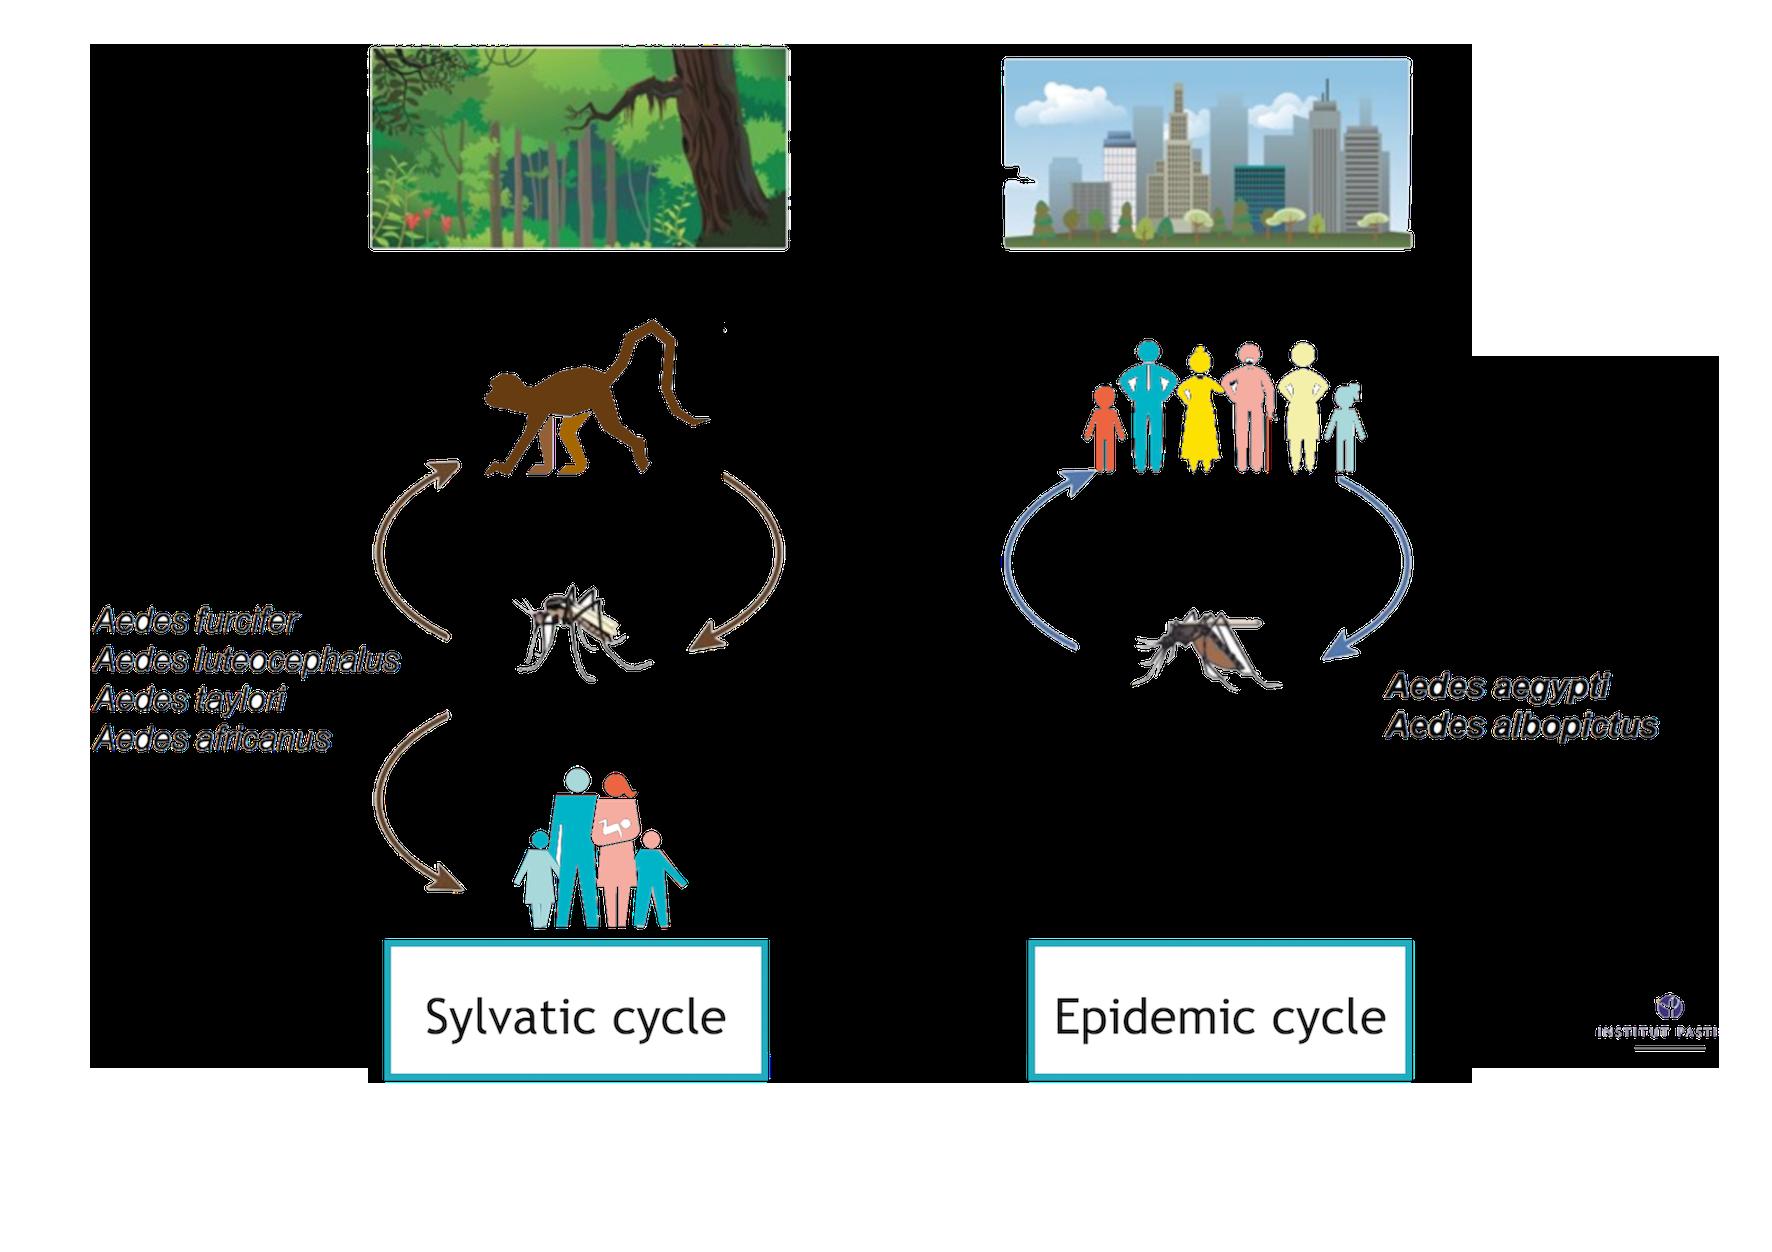 clipart black and white stock Team pasteur paris context. Vector born disease cycle